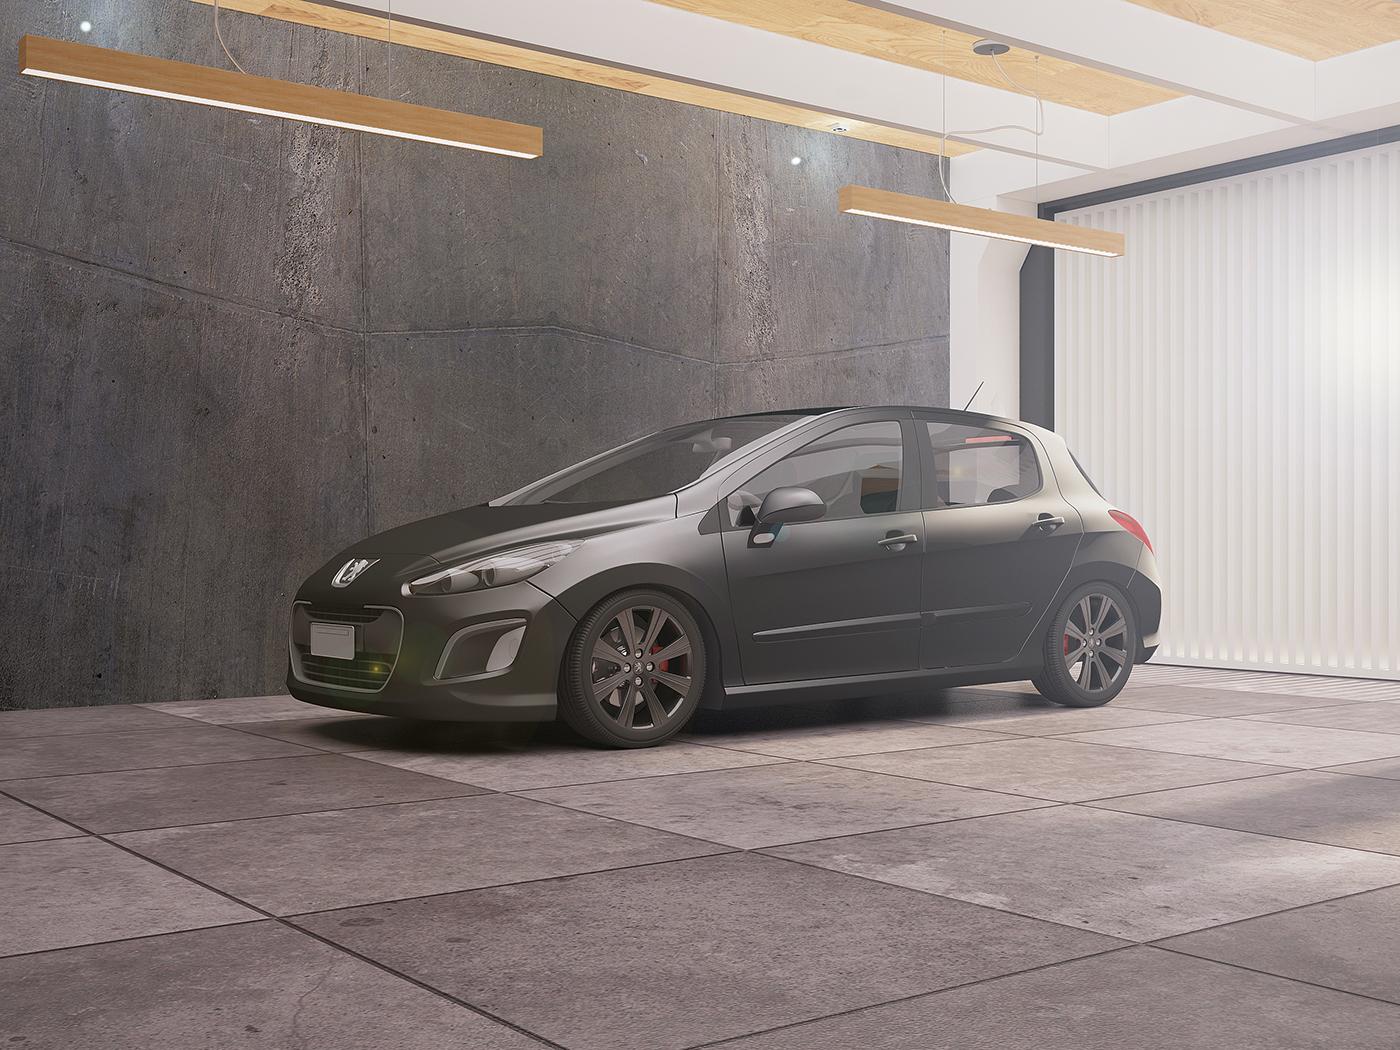 Peugeot 308 Vehicle CGI Render 3D